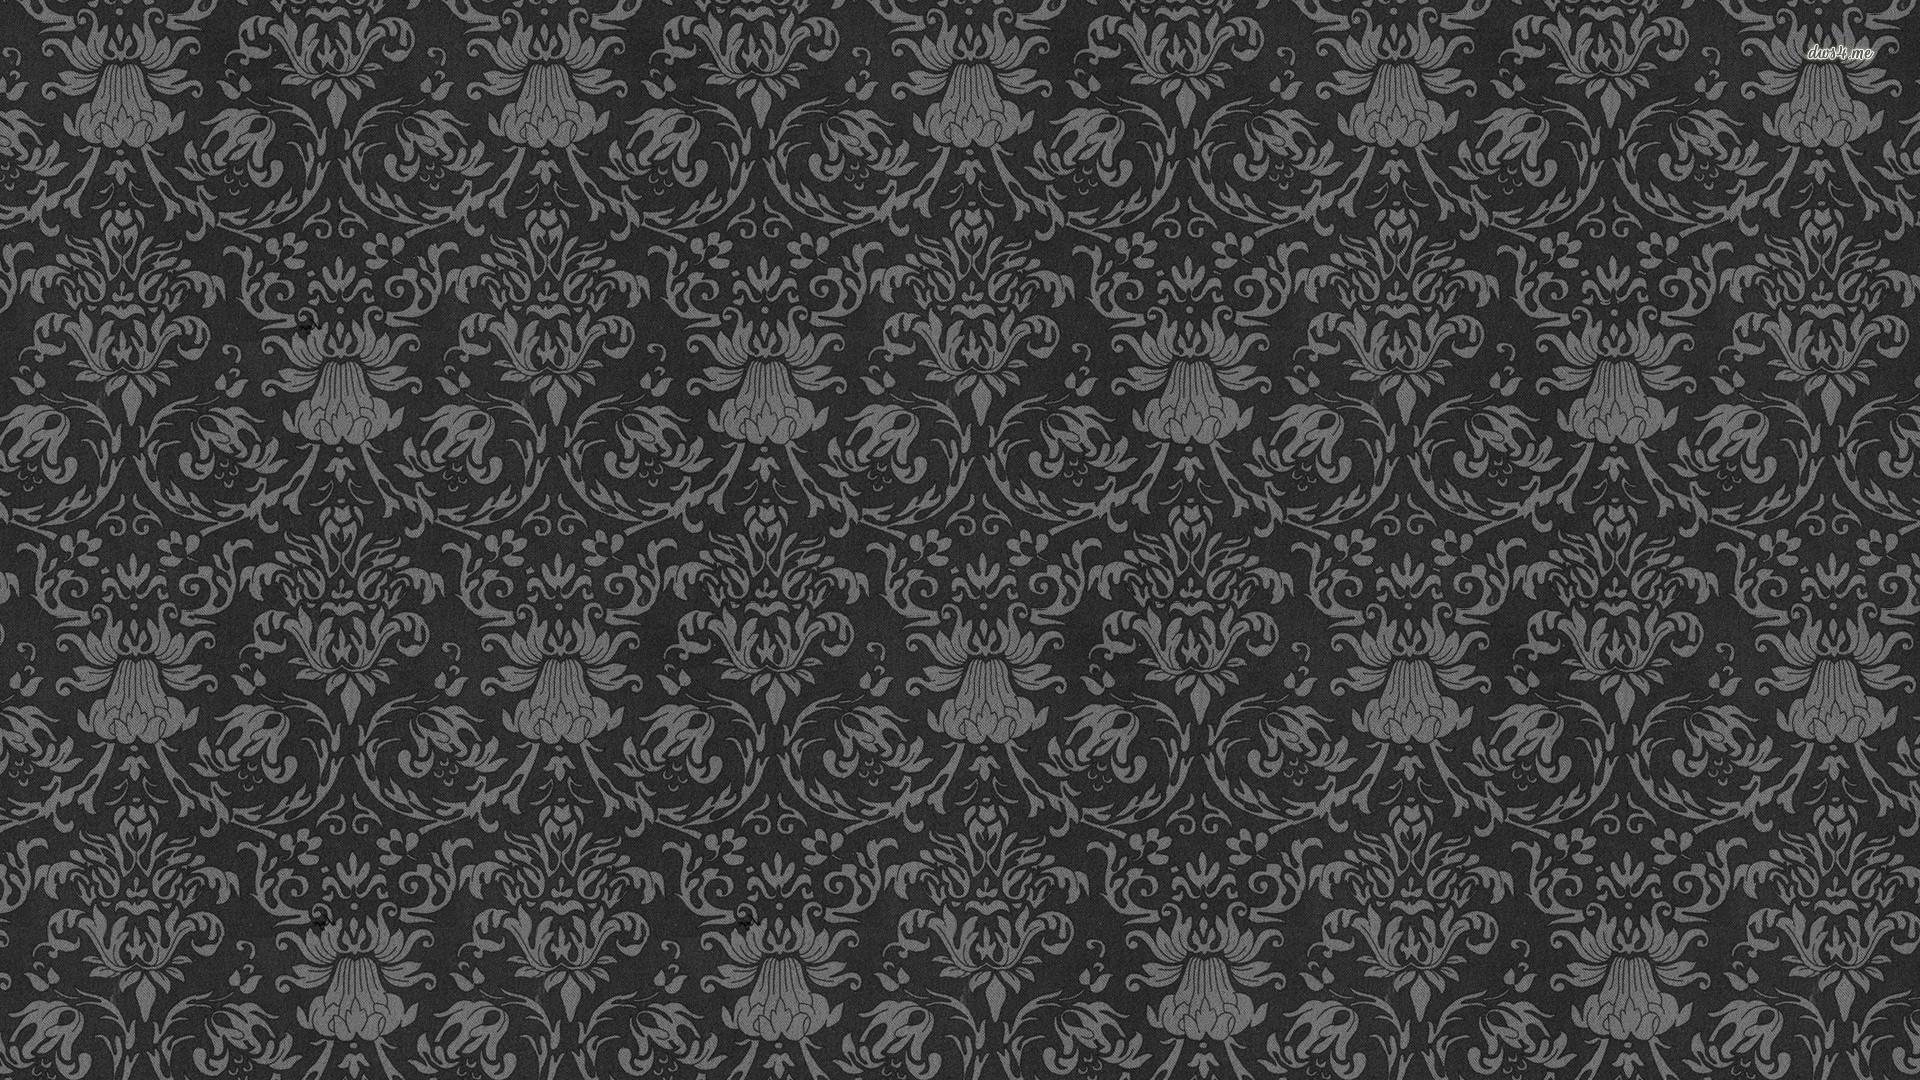 ... Vintage floral pattern wallpaper 1920x1080 ...